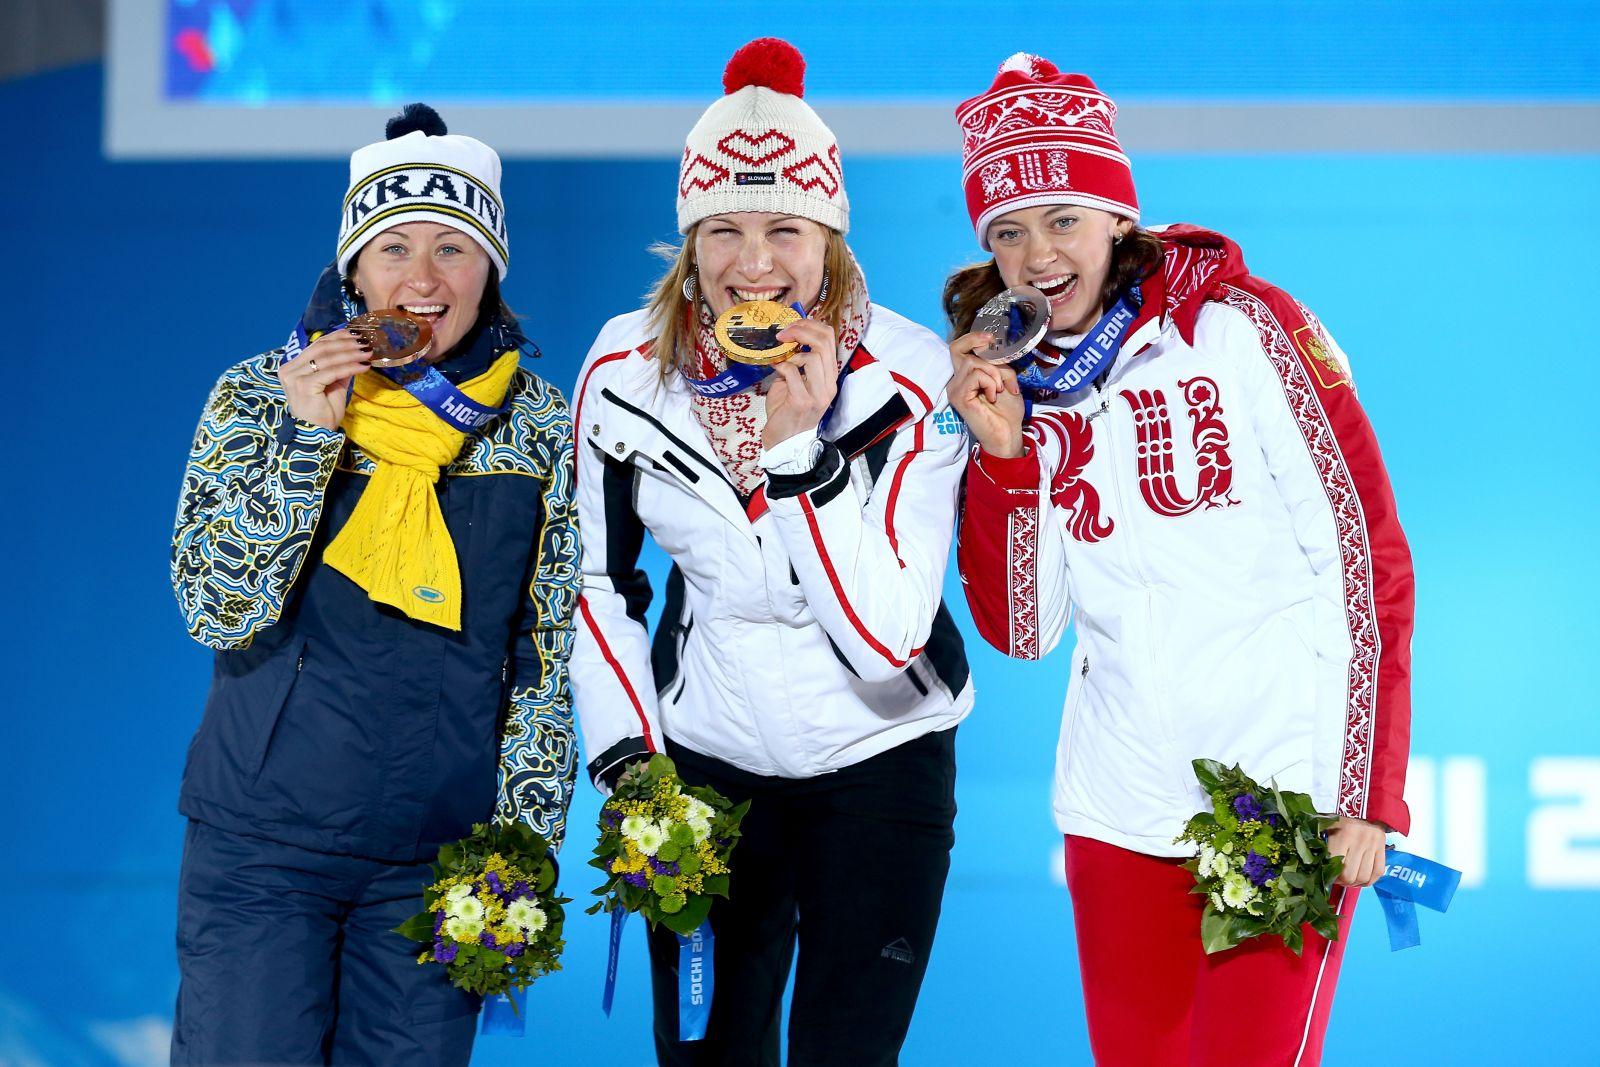 Украинки на зимних Олимпийских играх: пьедестал почета - фото №6